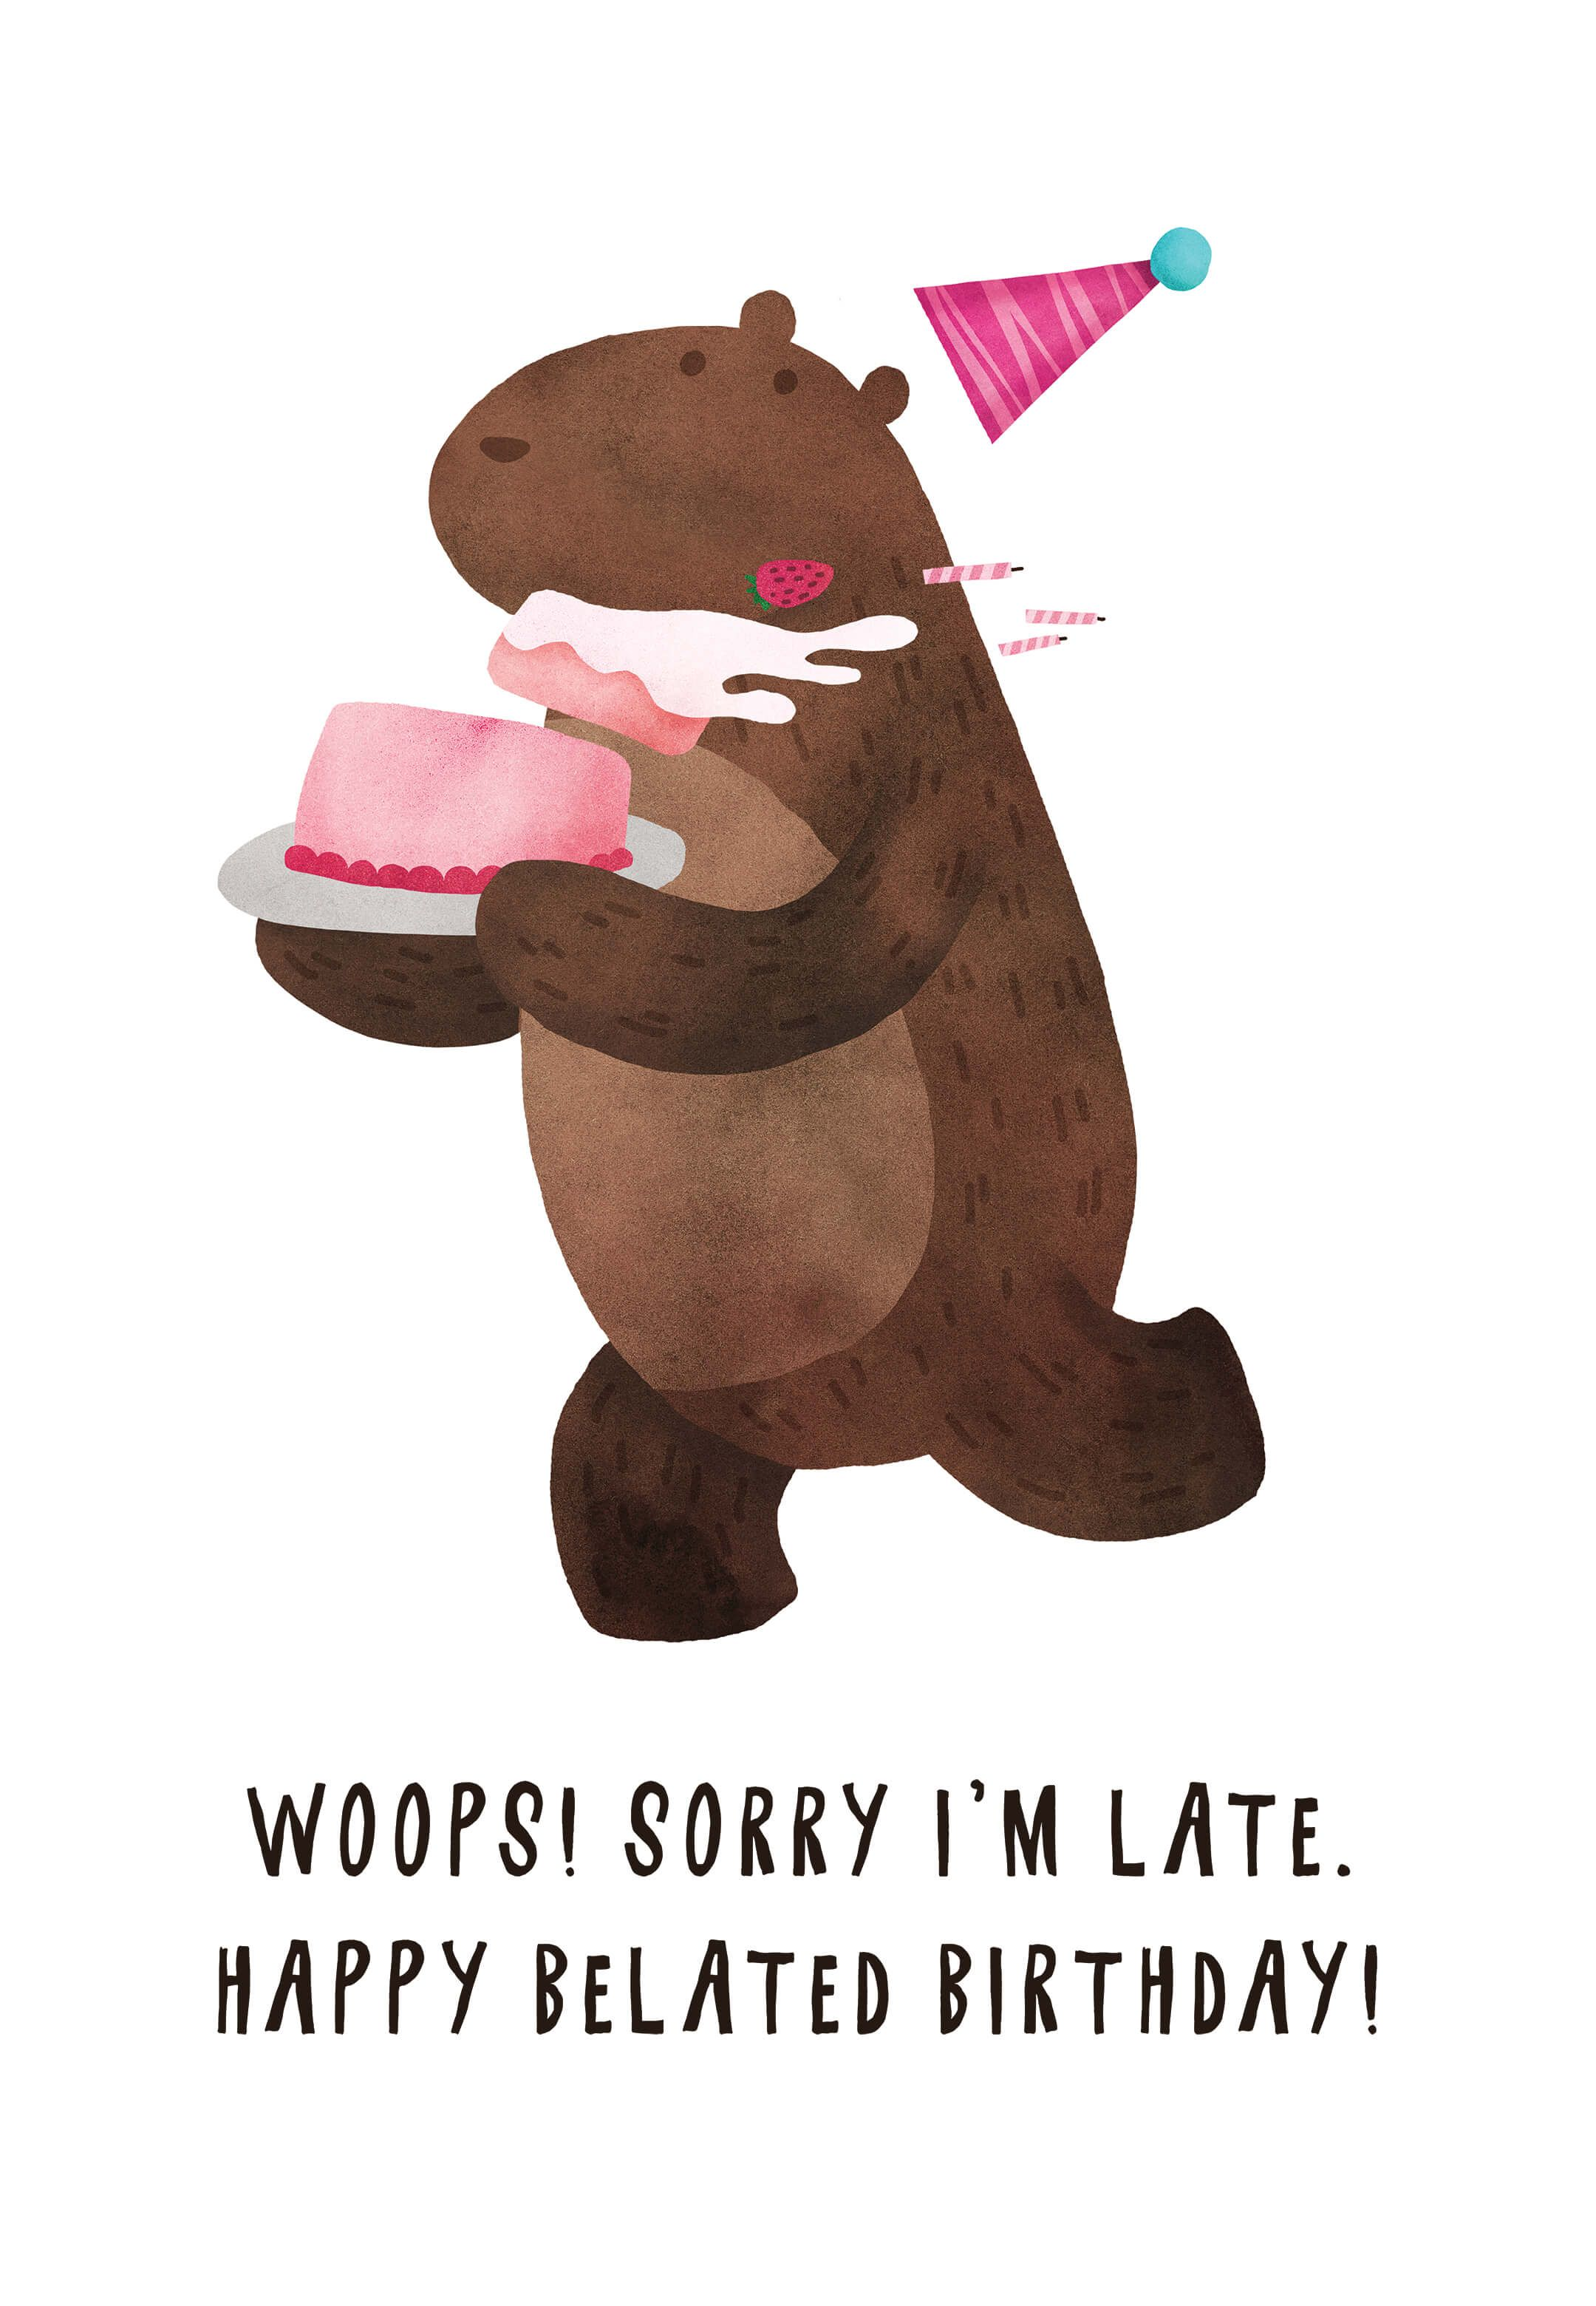 Belated Birthday Bear Birthday Card Free Greetings Island Belated Birthday Card Happy Late Birthday Belated Birthday Wishes